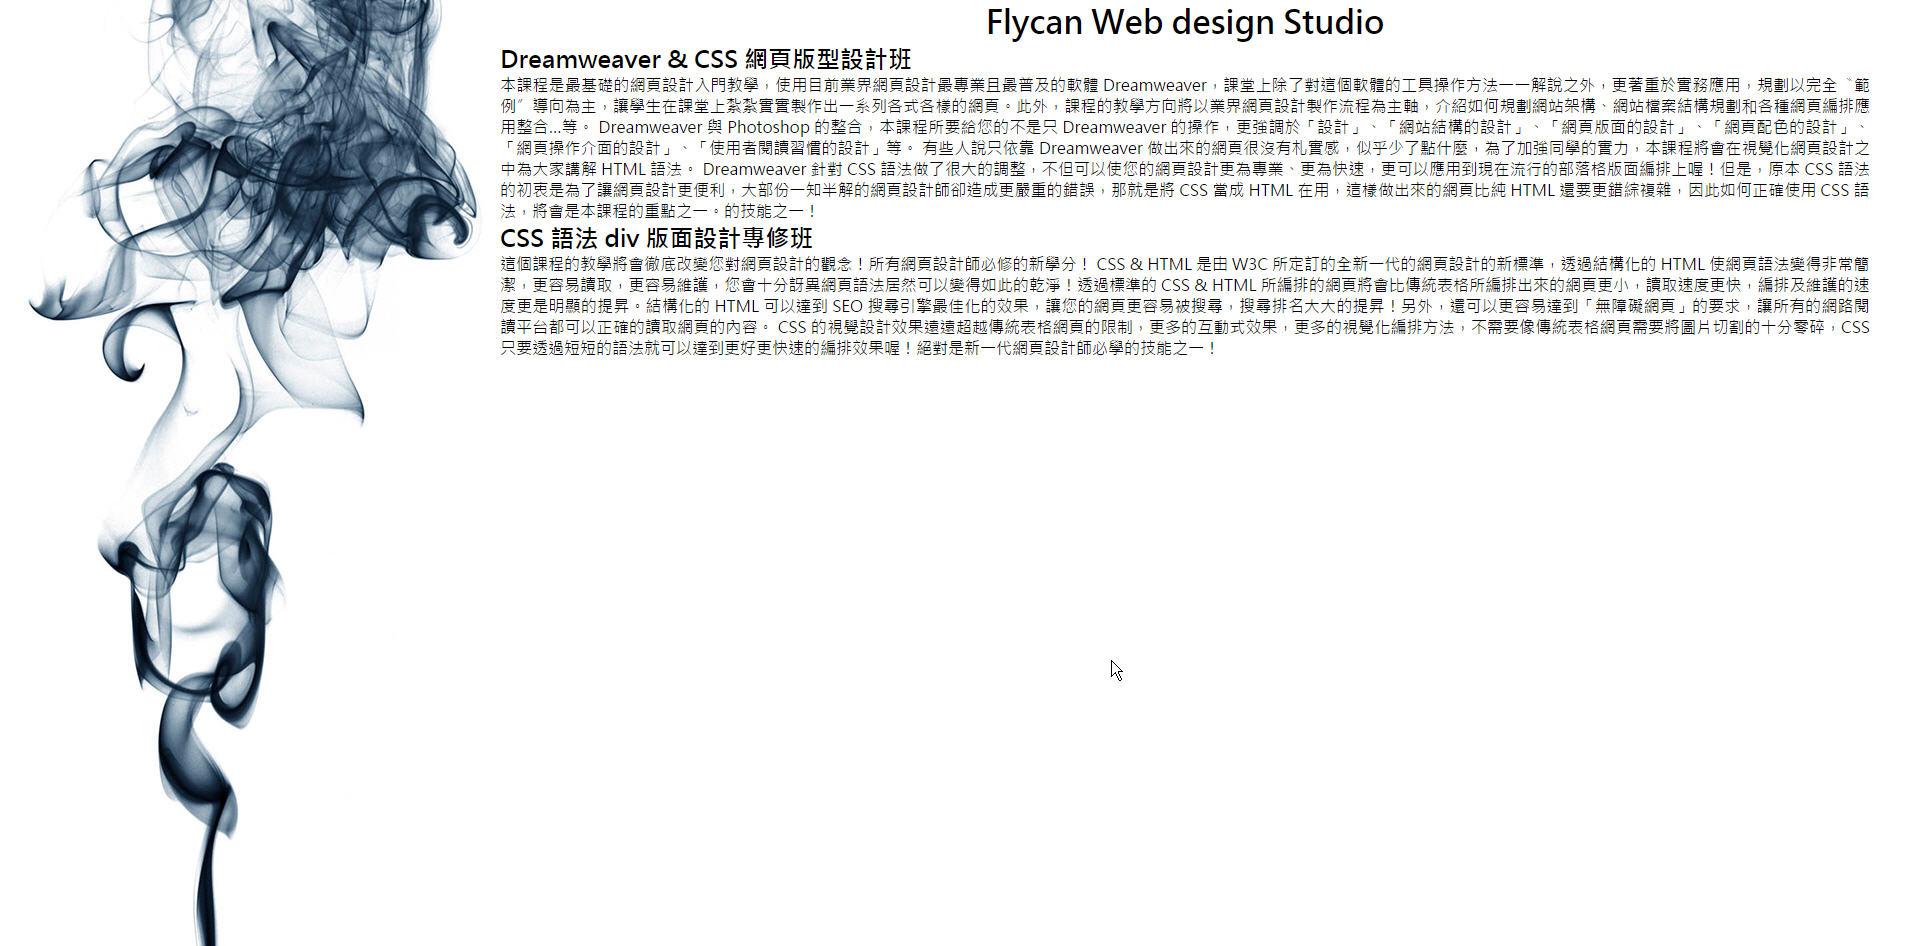 CSS 語法 - 網頁設計 Free Resource 好康報報 Good Design 好站報報  - 【設計資源】 - Google Fonts 免費雲端字庫-實作篇 - 05